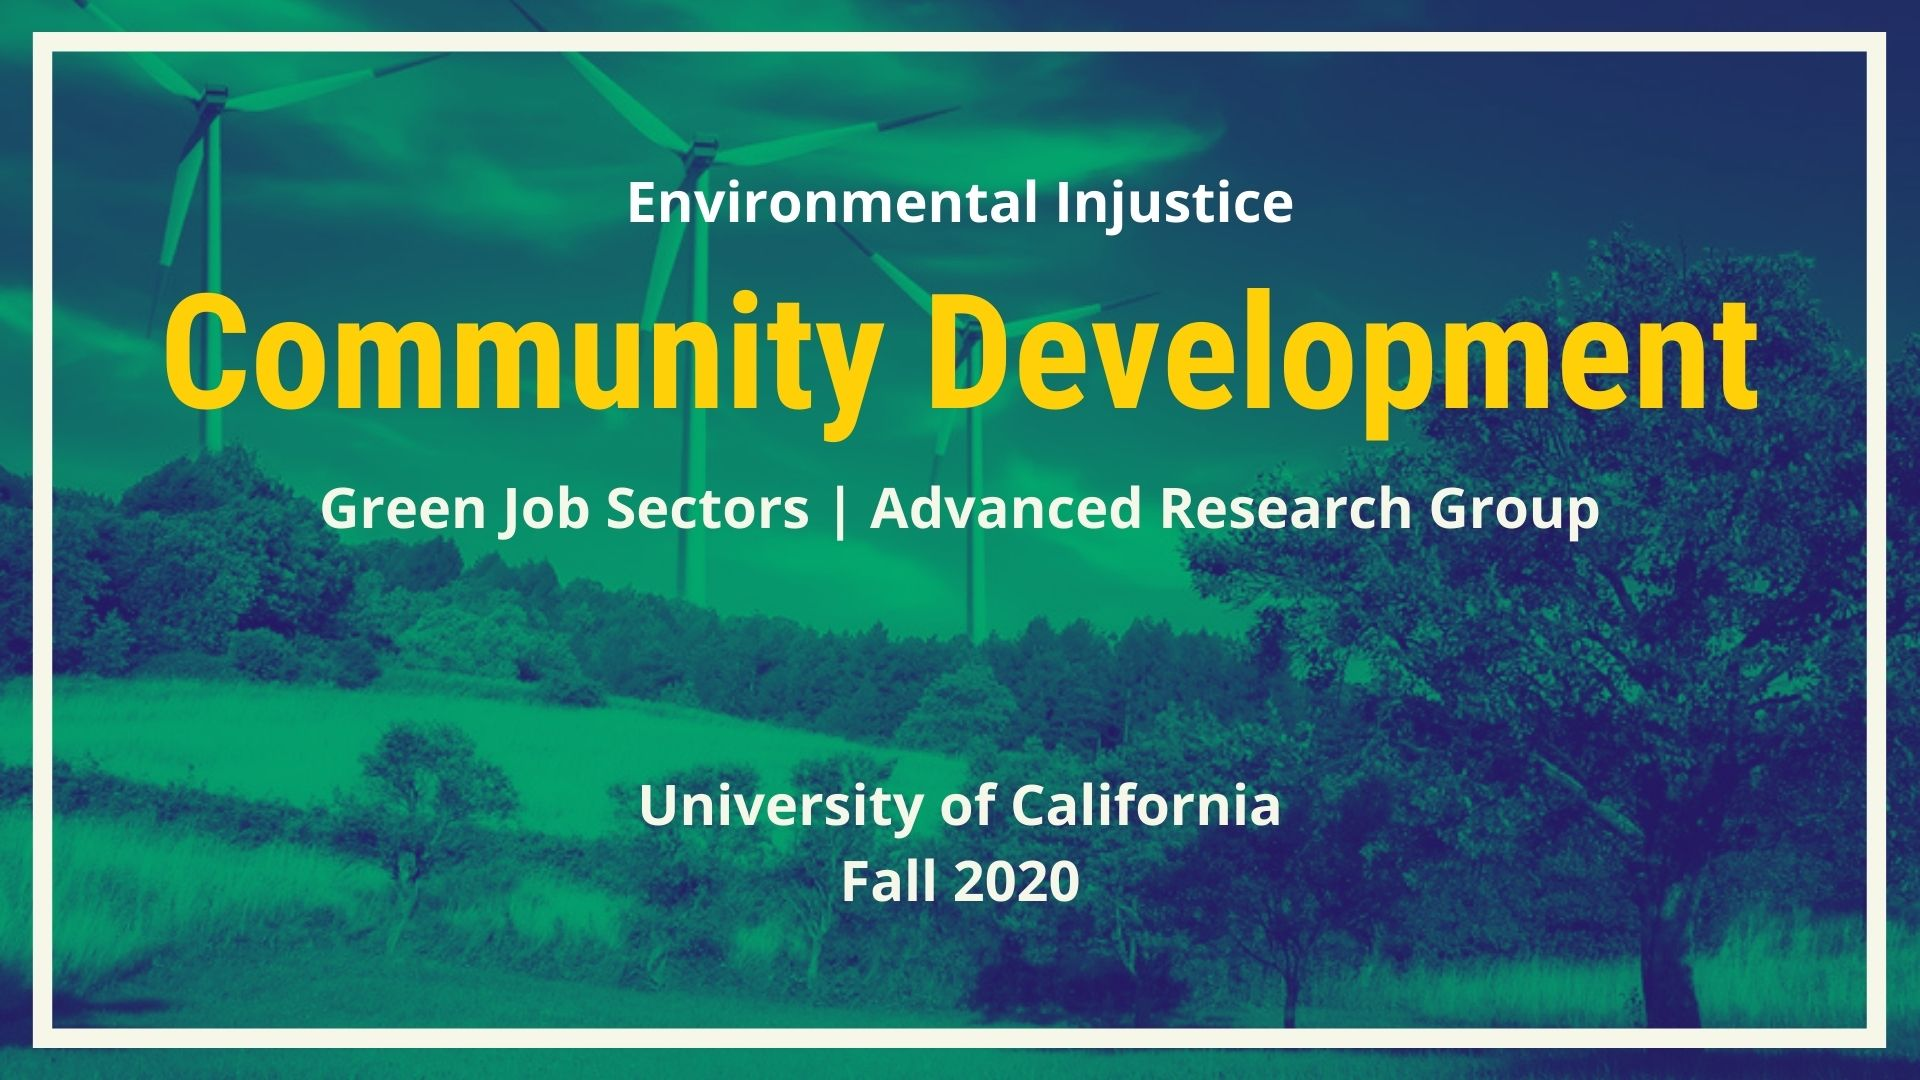 Green Job Sector: Community Development